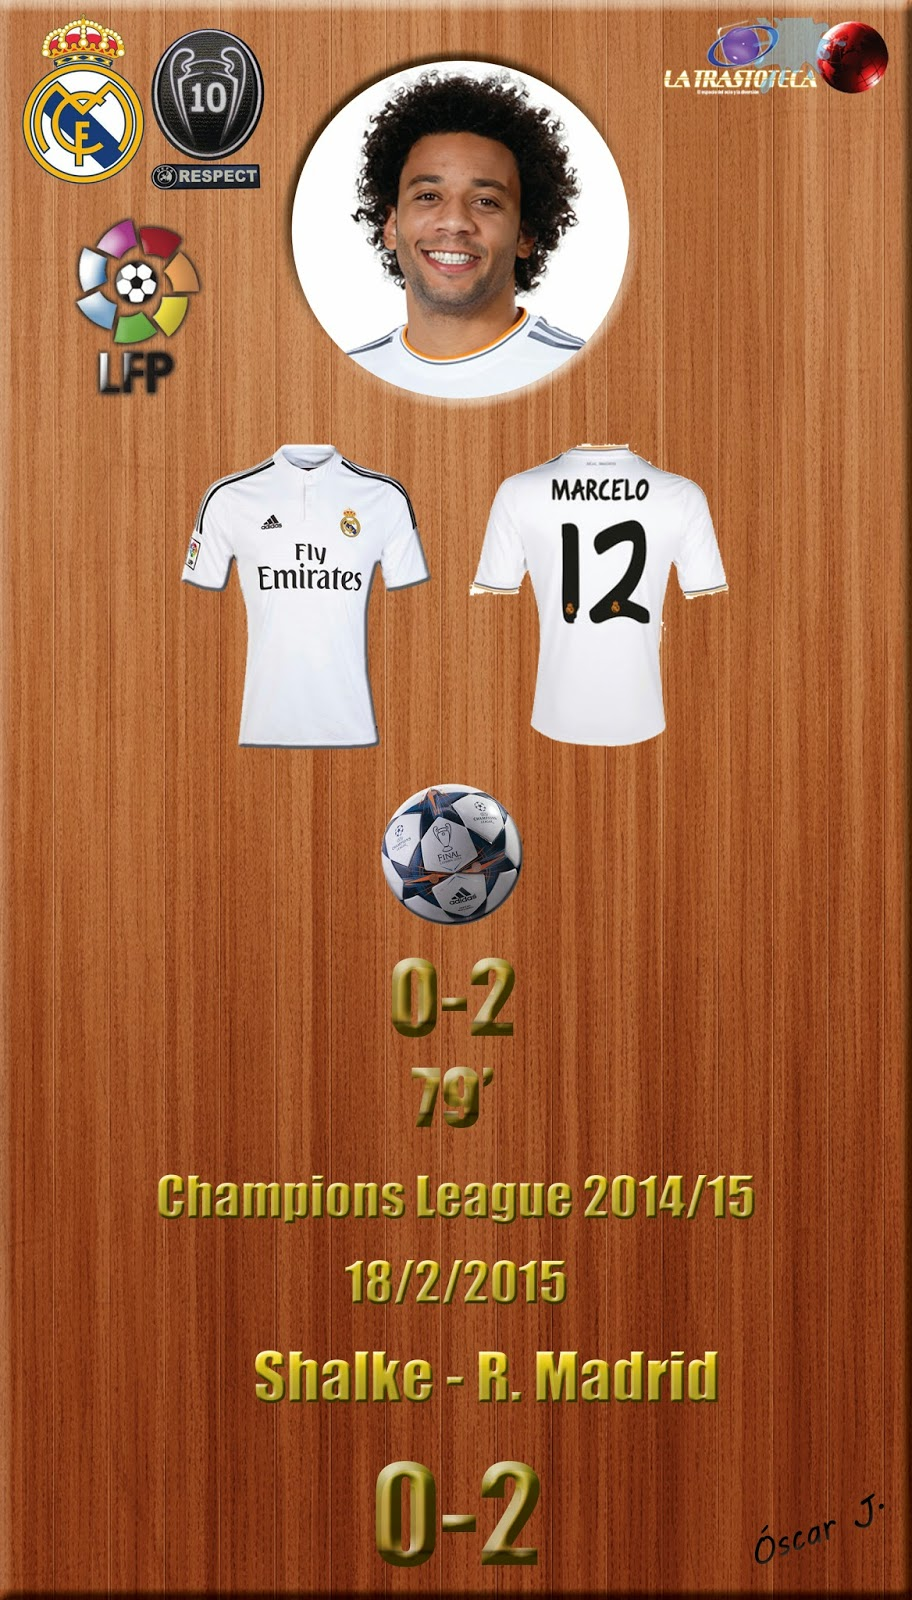 Marcelo (0-1) - Shalke 04 0-2 Real Madrid - Champions League 2014/15 - Octavos - (18/2/2014)